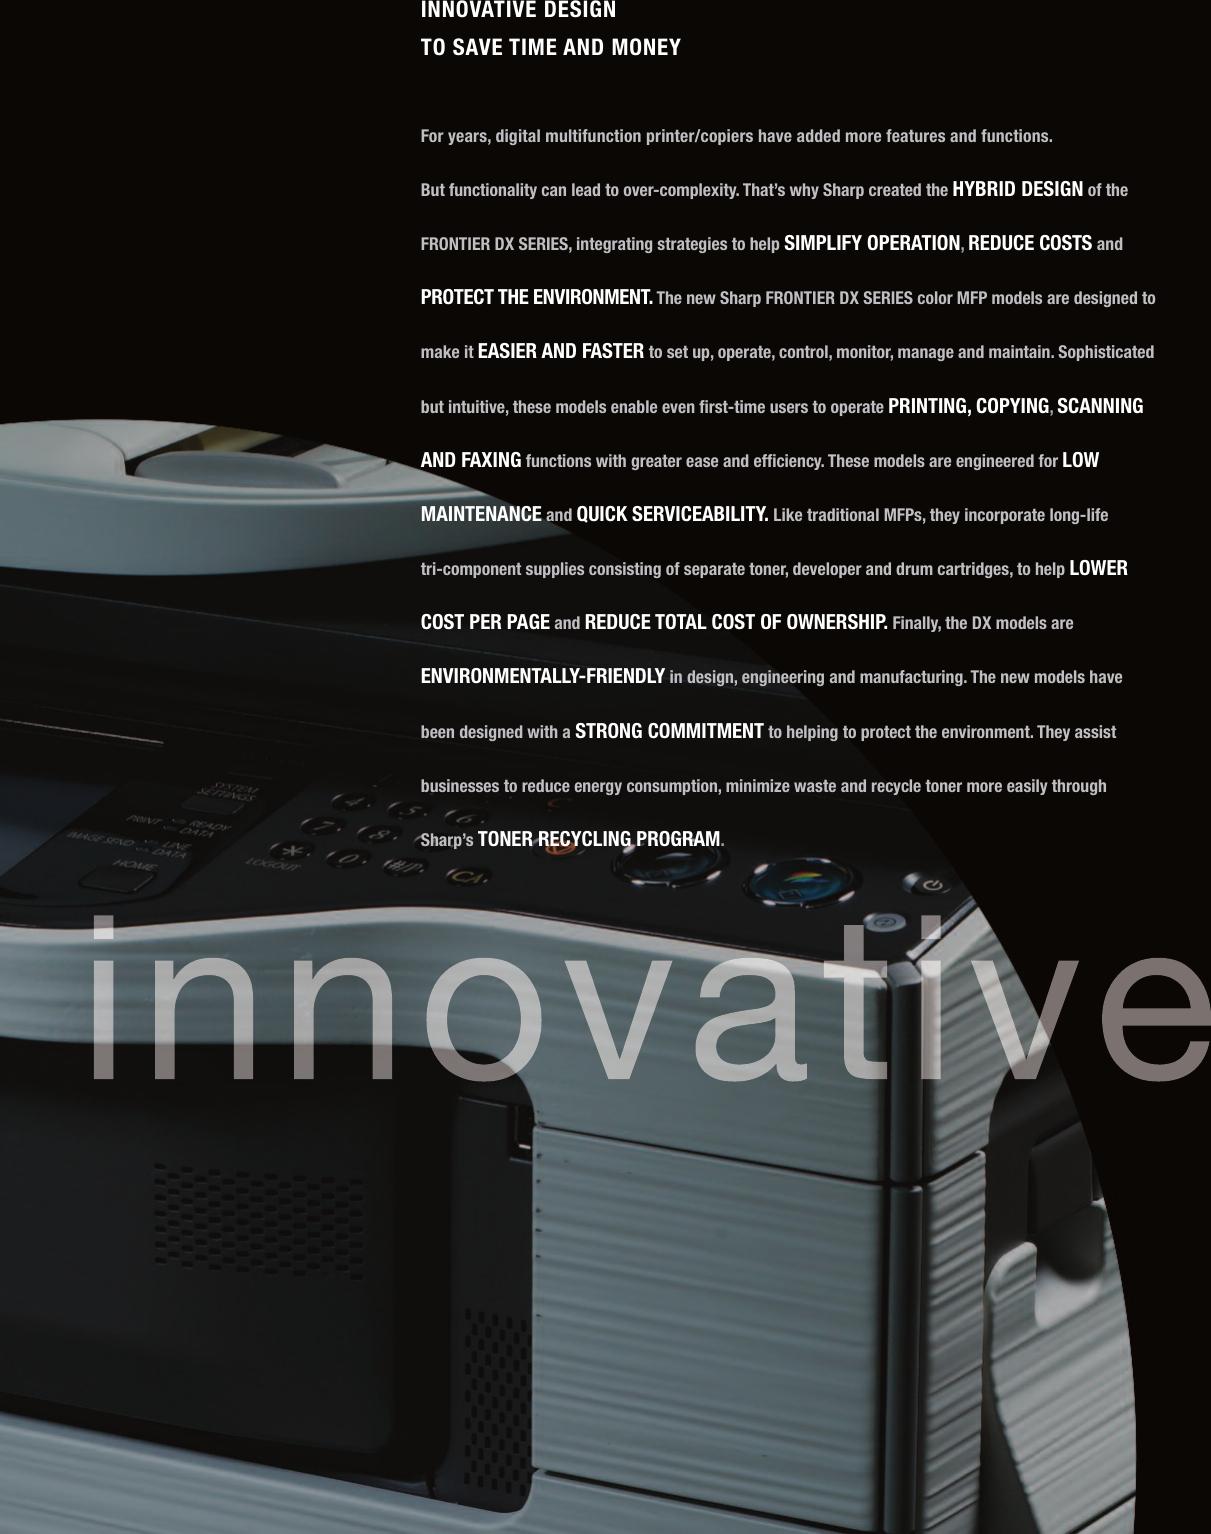 SHARP DX-C310 PRINTER PCL5C DRIVERS FOR WINDOWS